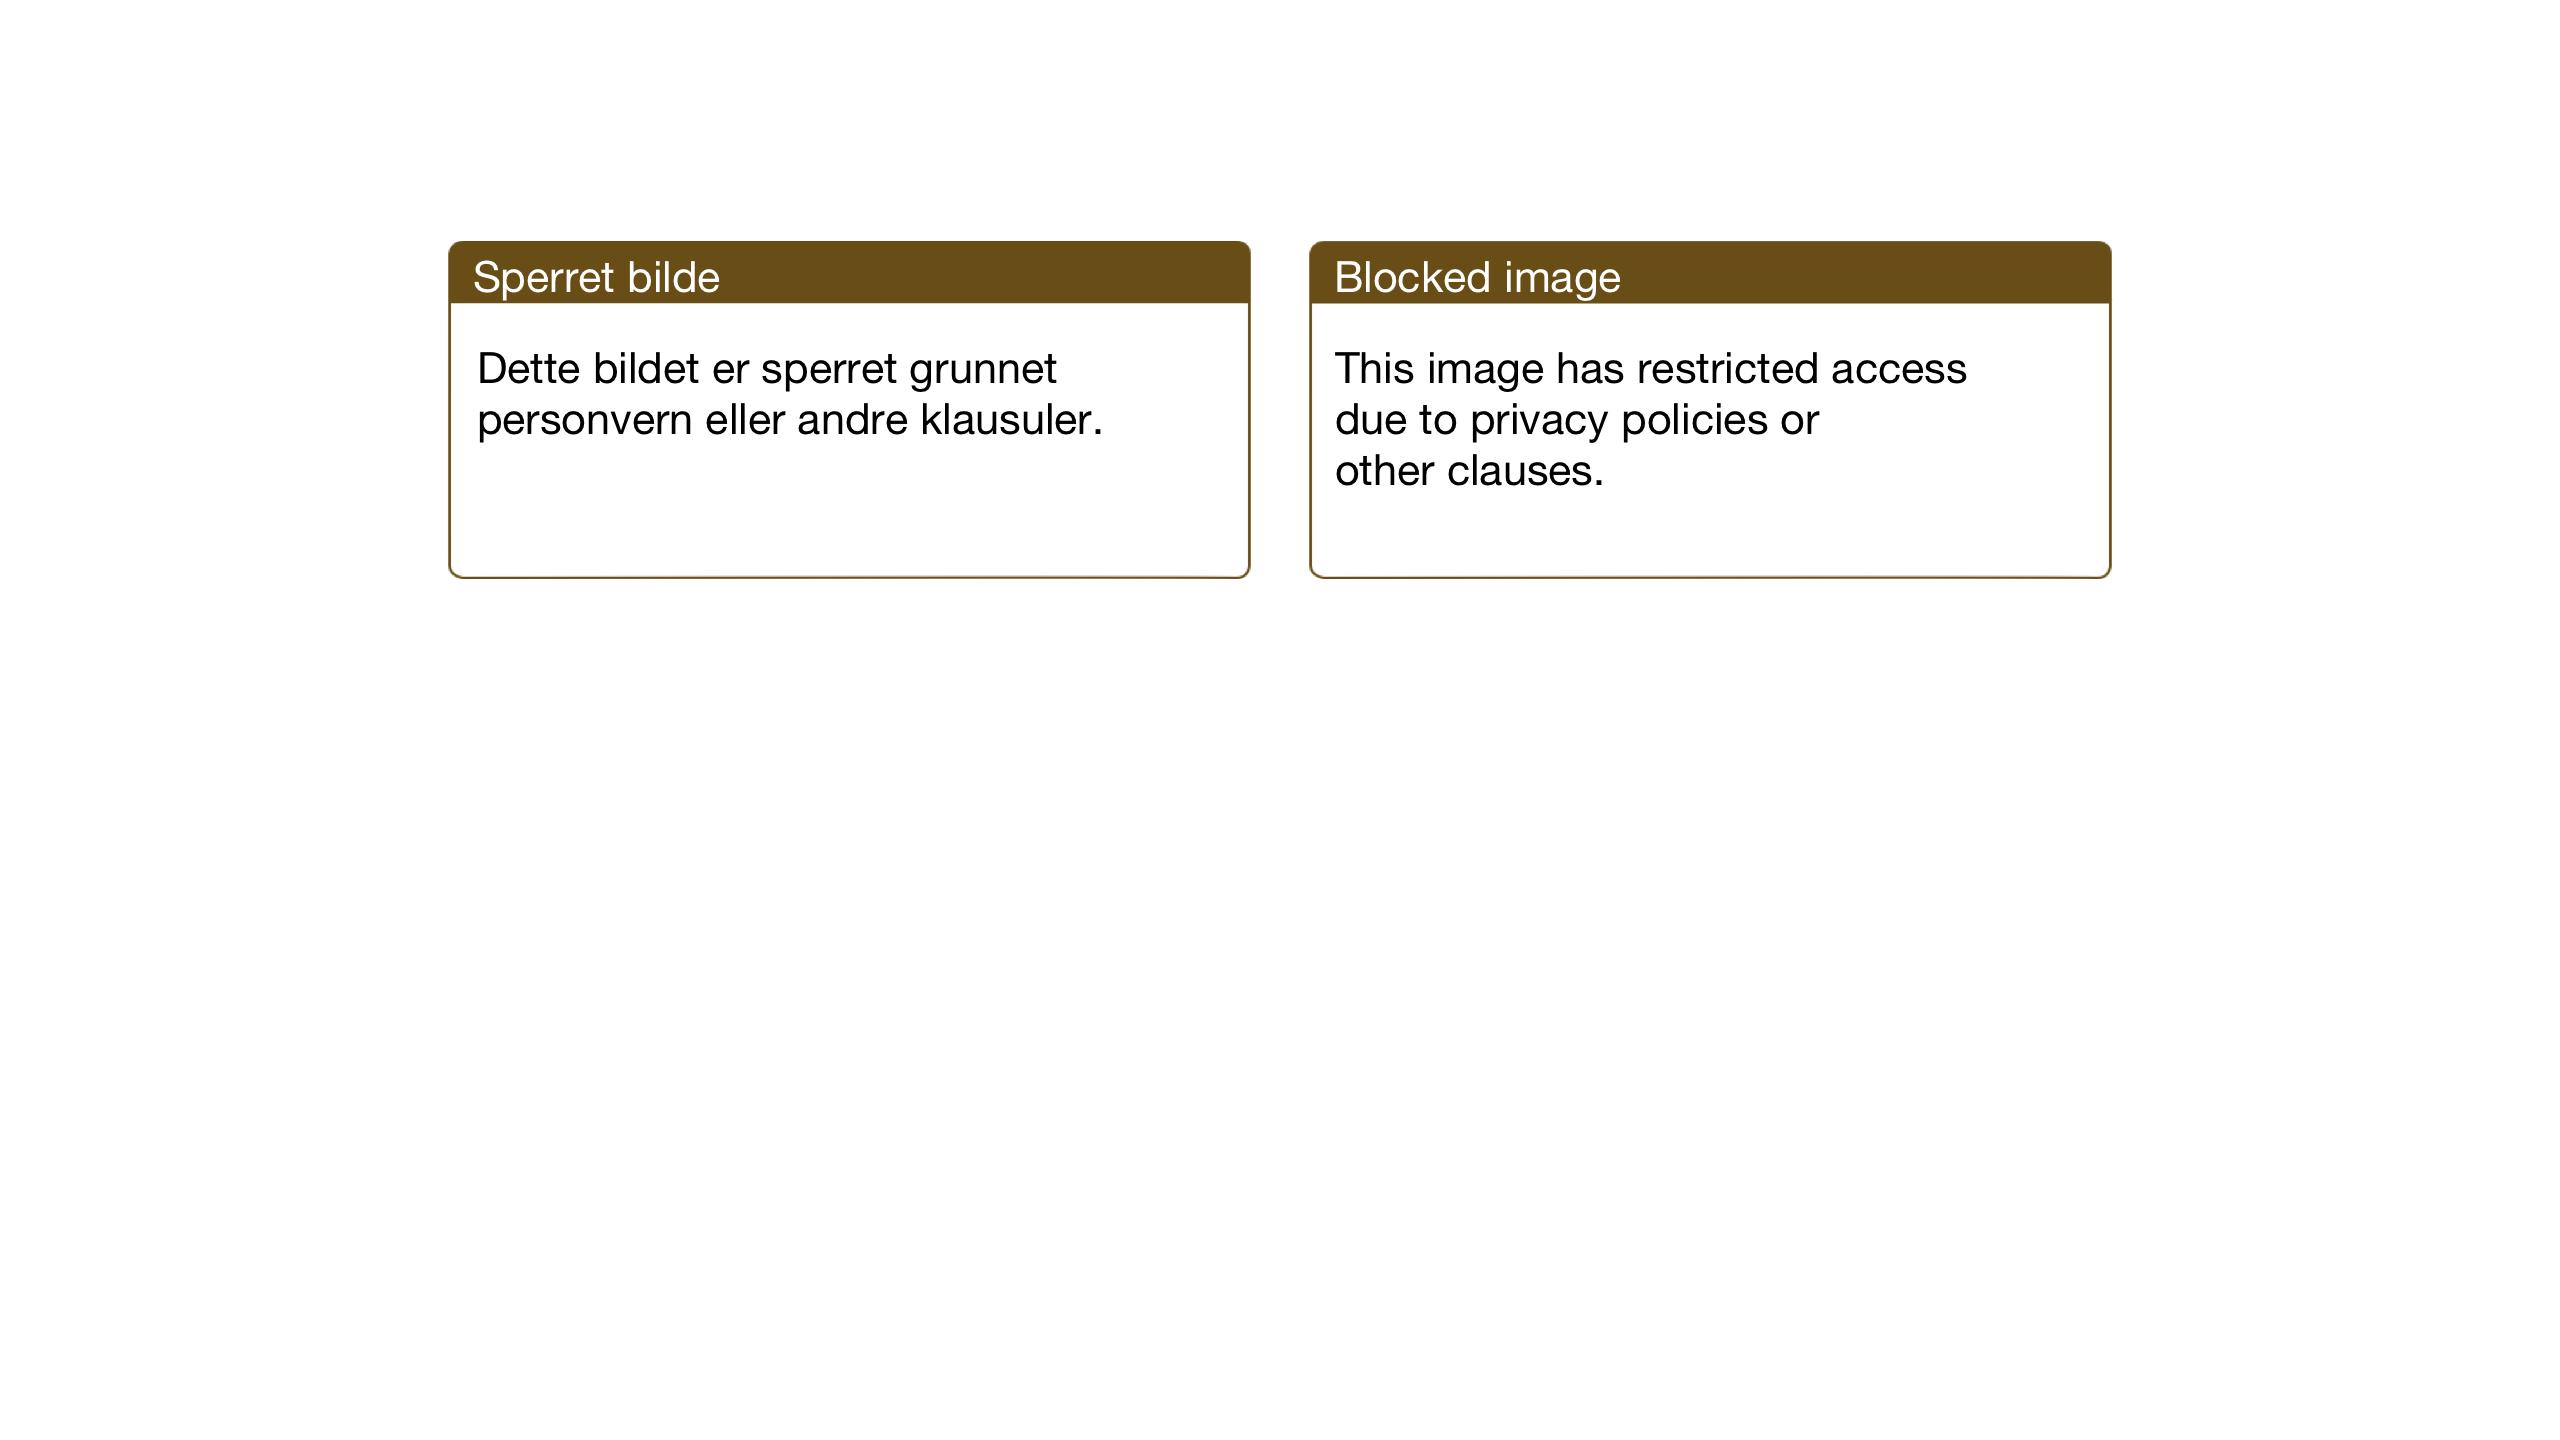 SAT, Ministerialprotokoller, klokkerbøker og fødselsregistre - Nordland, 847/L0680: Klokkerbok nr. 847C08, 1930-1947, s. 8